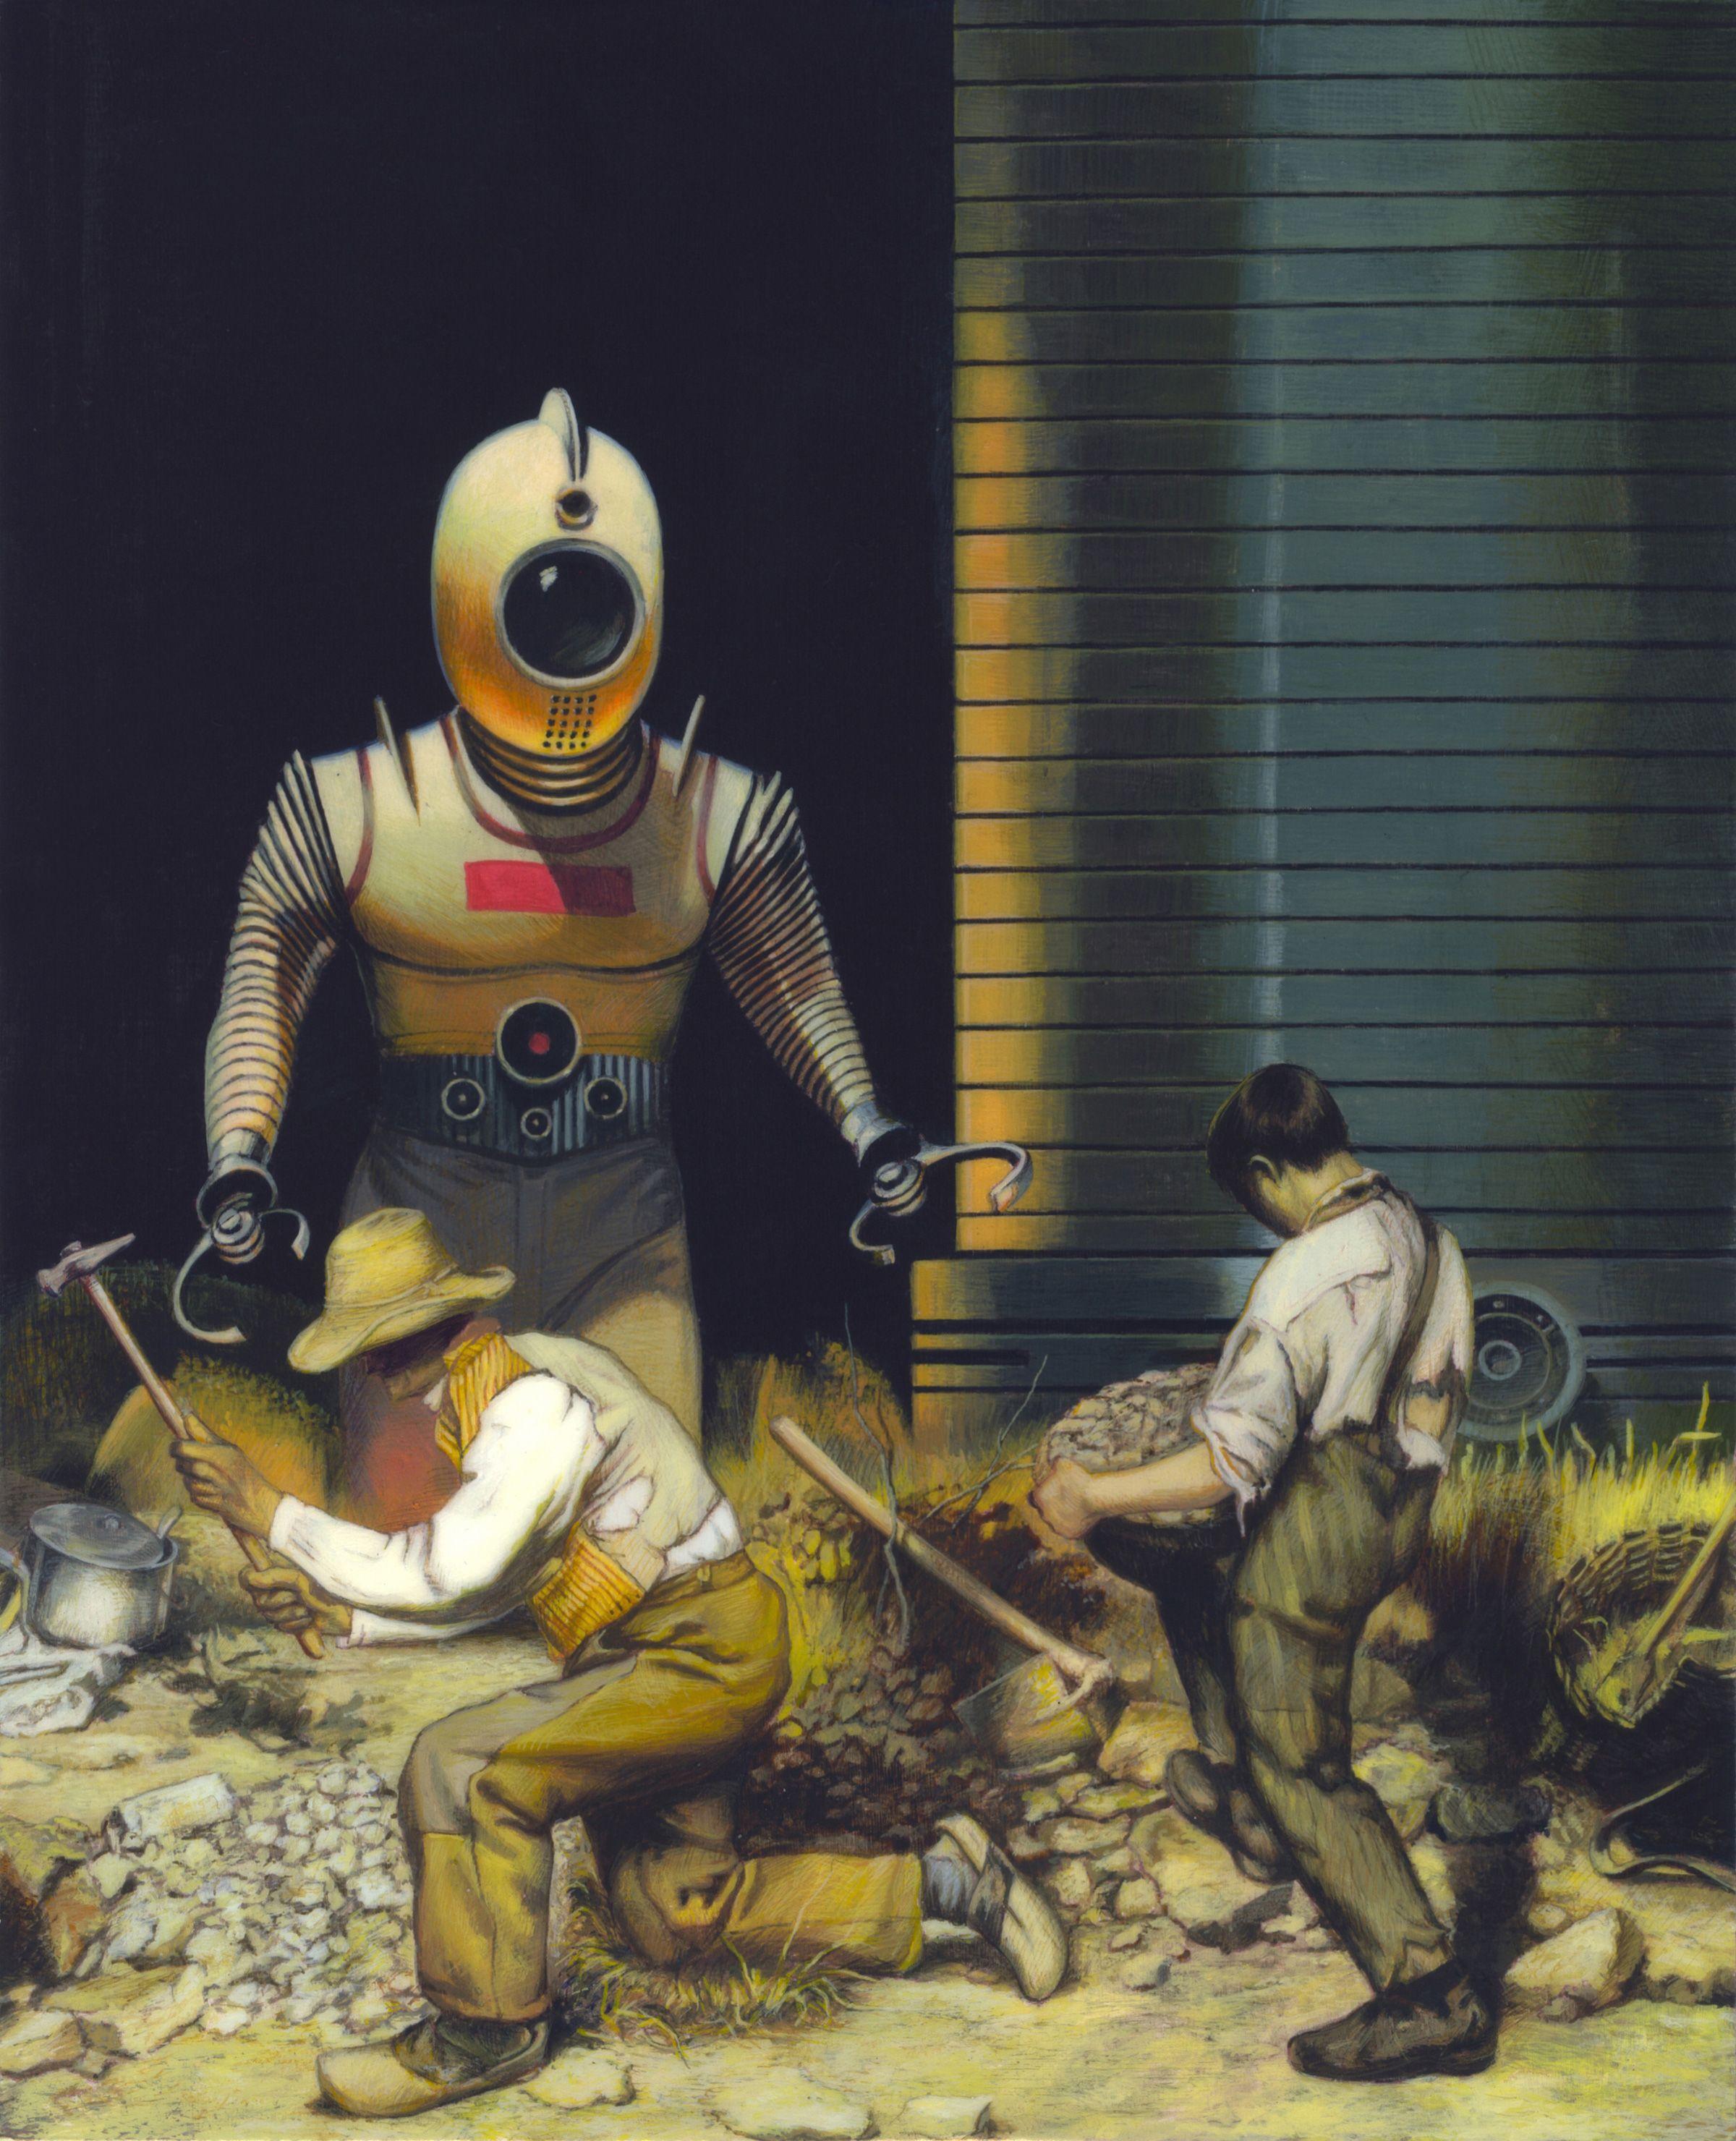 Vintage Sci Fi Art Added A New Photo: Art, Science Fiction